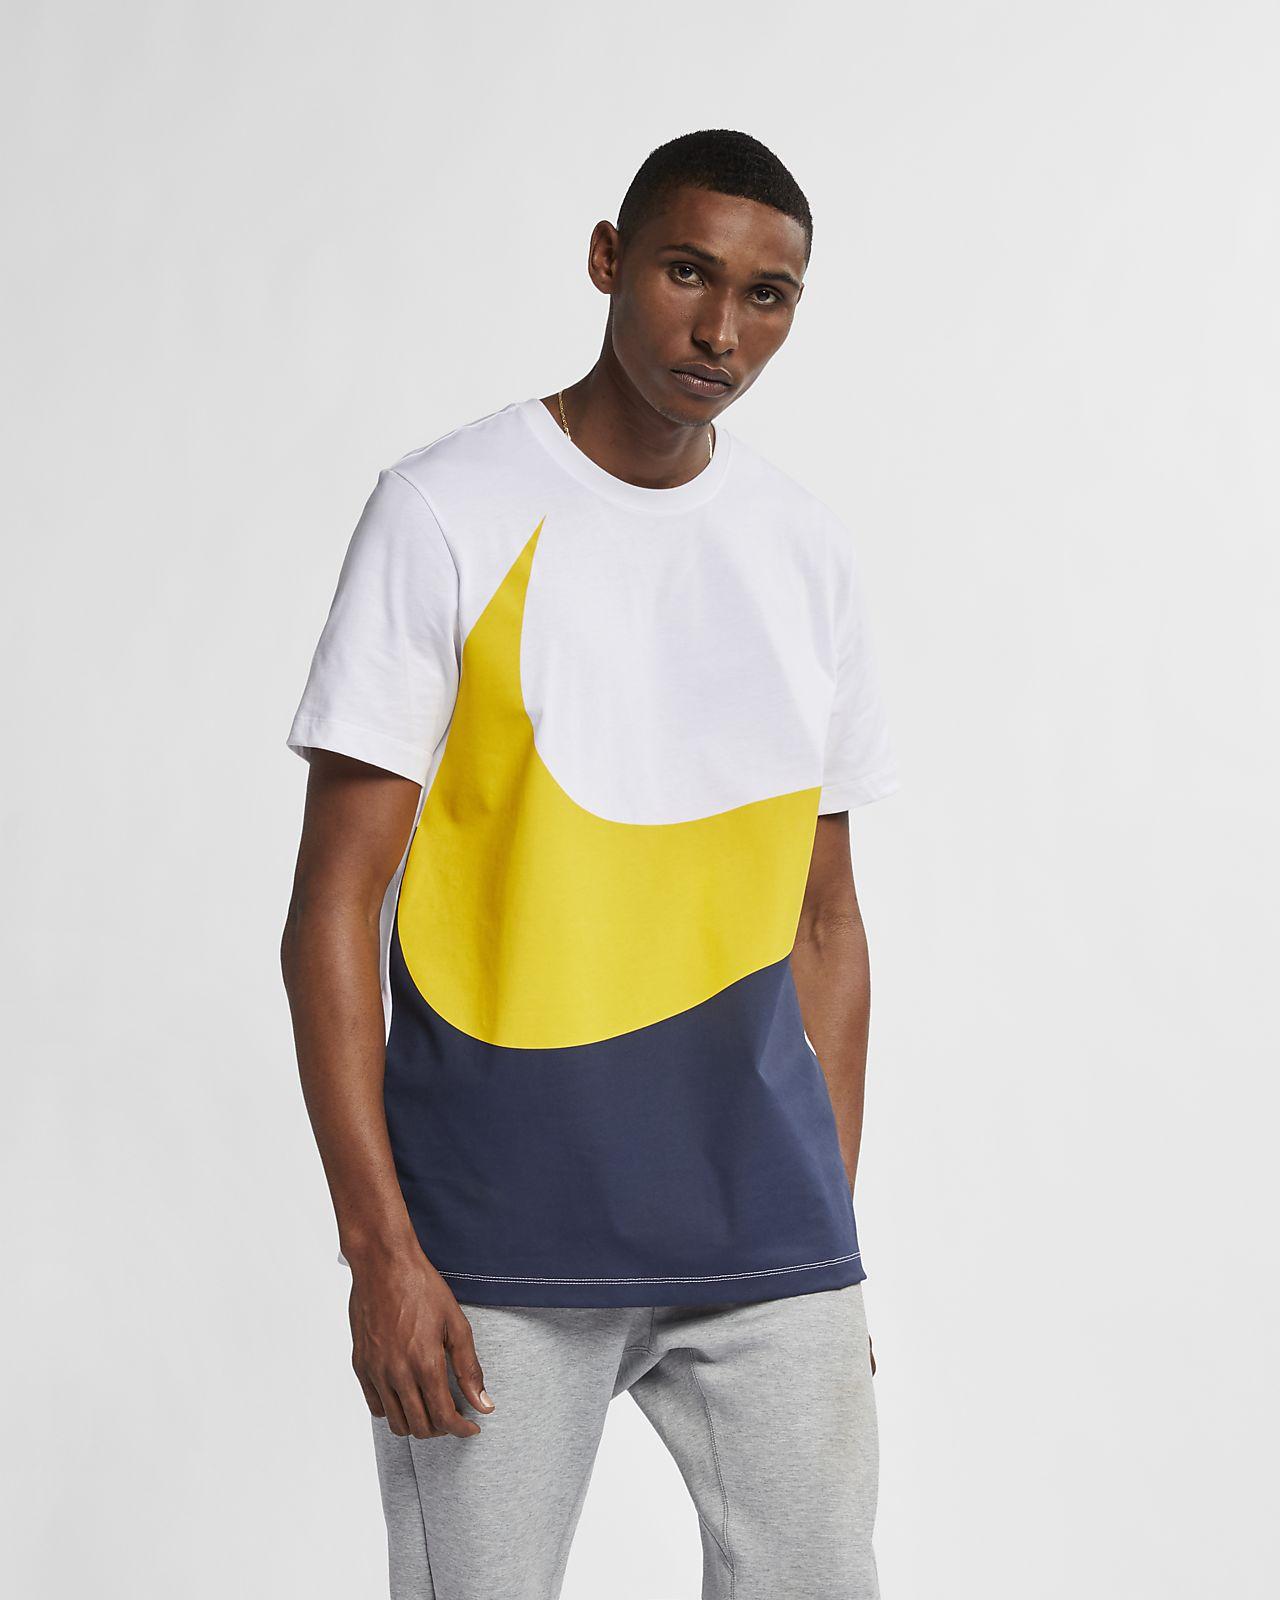 c6271892d8586 Nike Sportswear Swoosh Men s T-Shirt. Nike.com GB